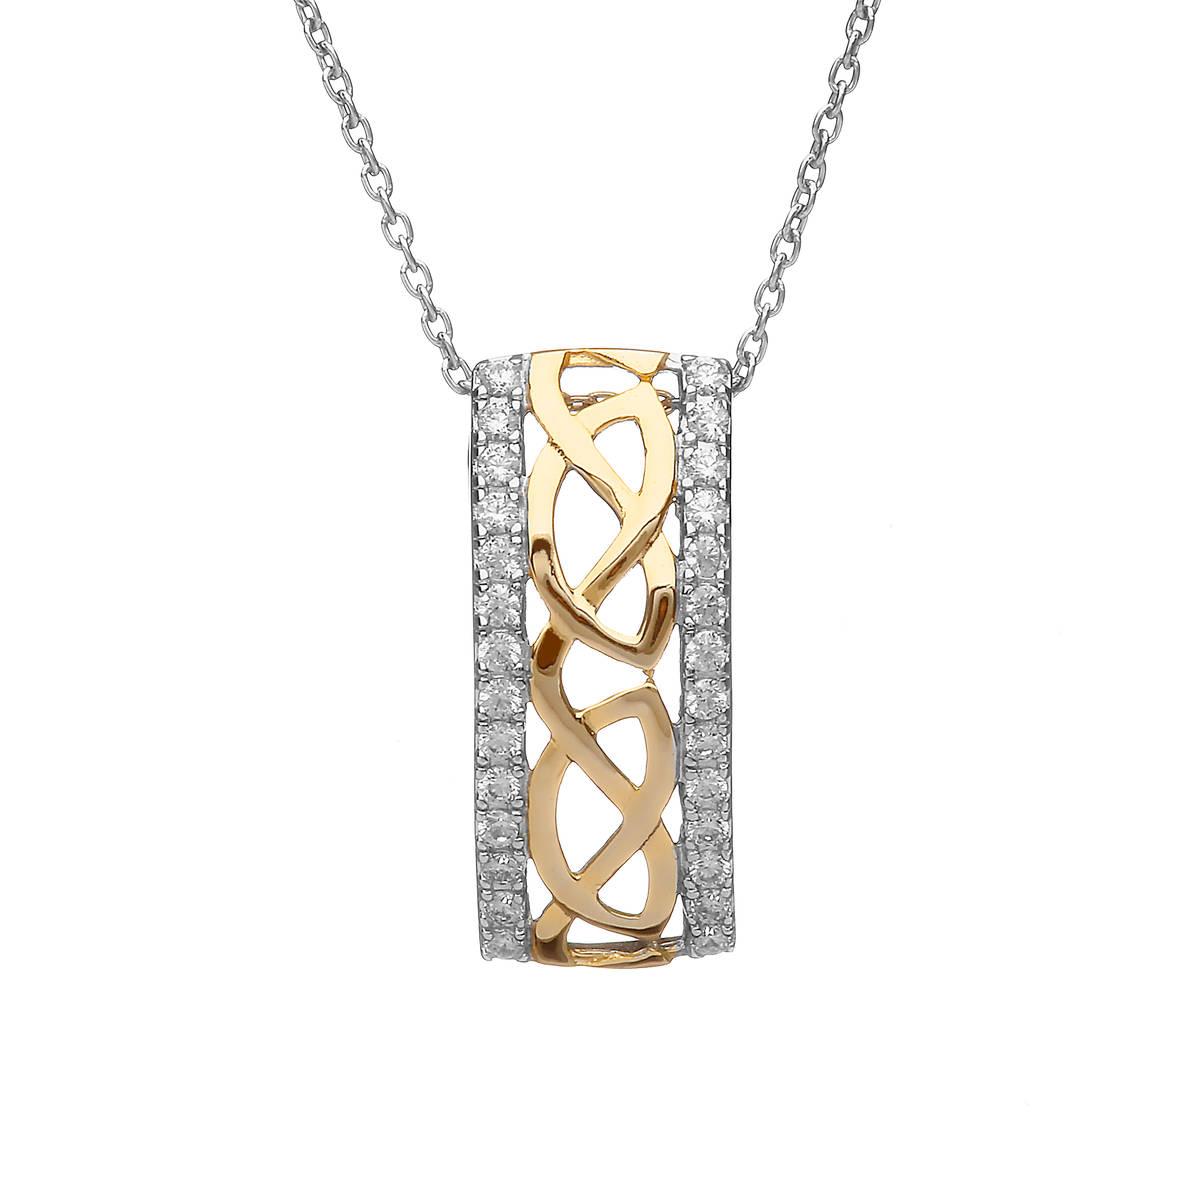 Silver/gp Celtic Pendant With Cz